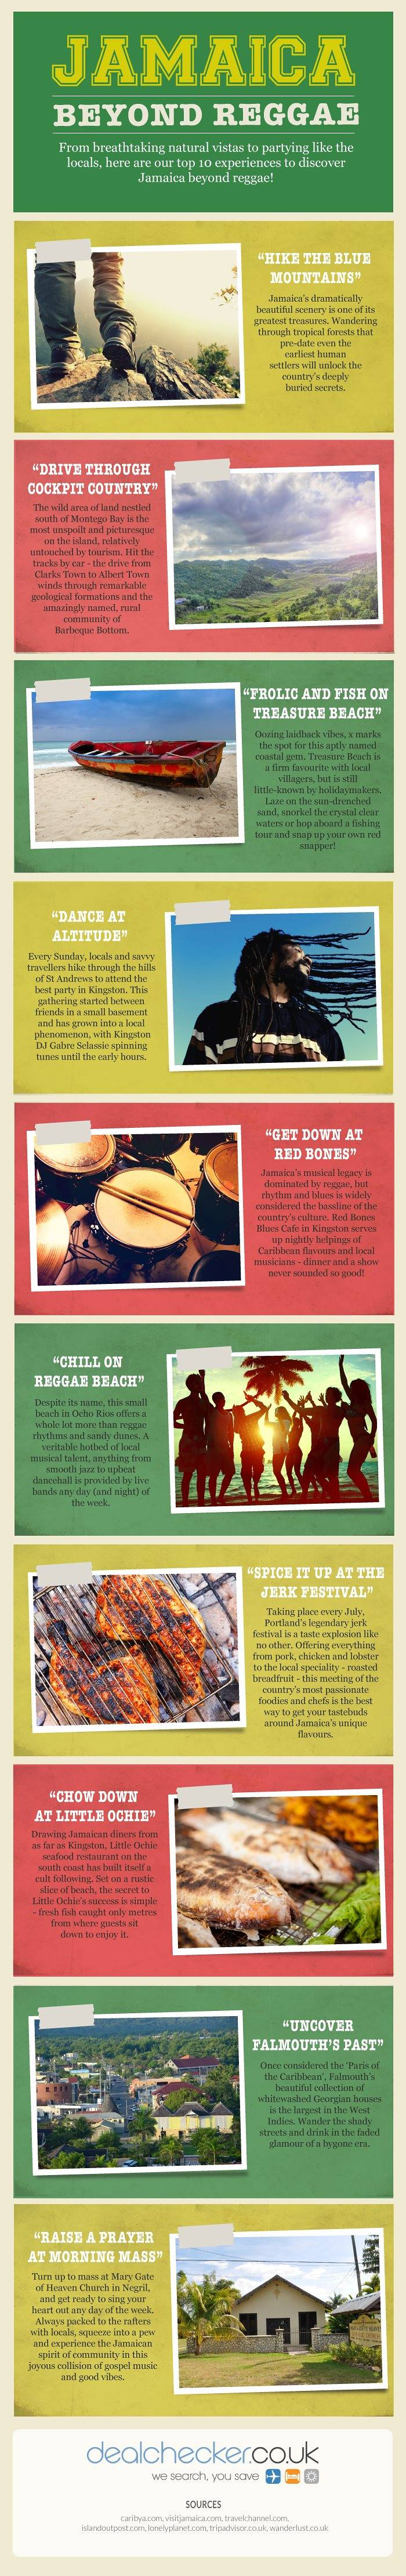 Jamaica Beyond Reggae